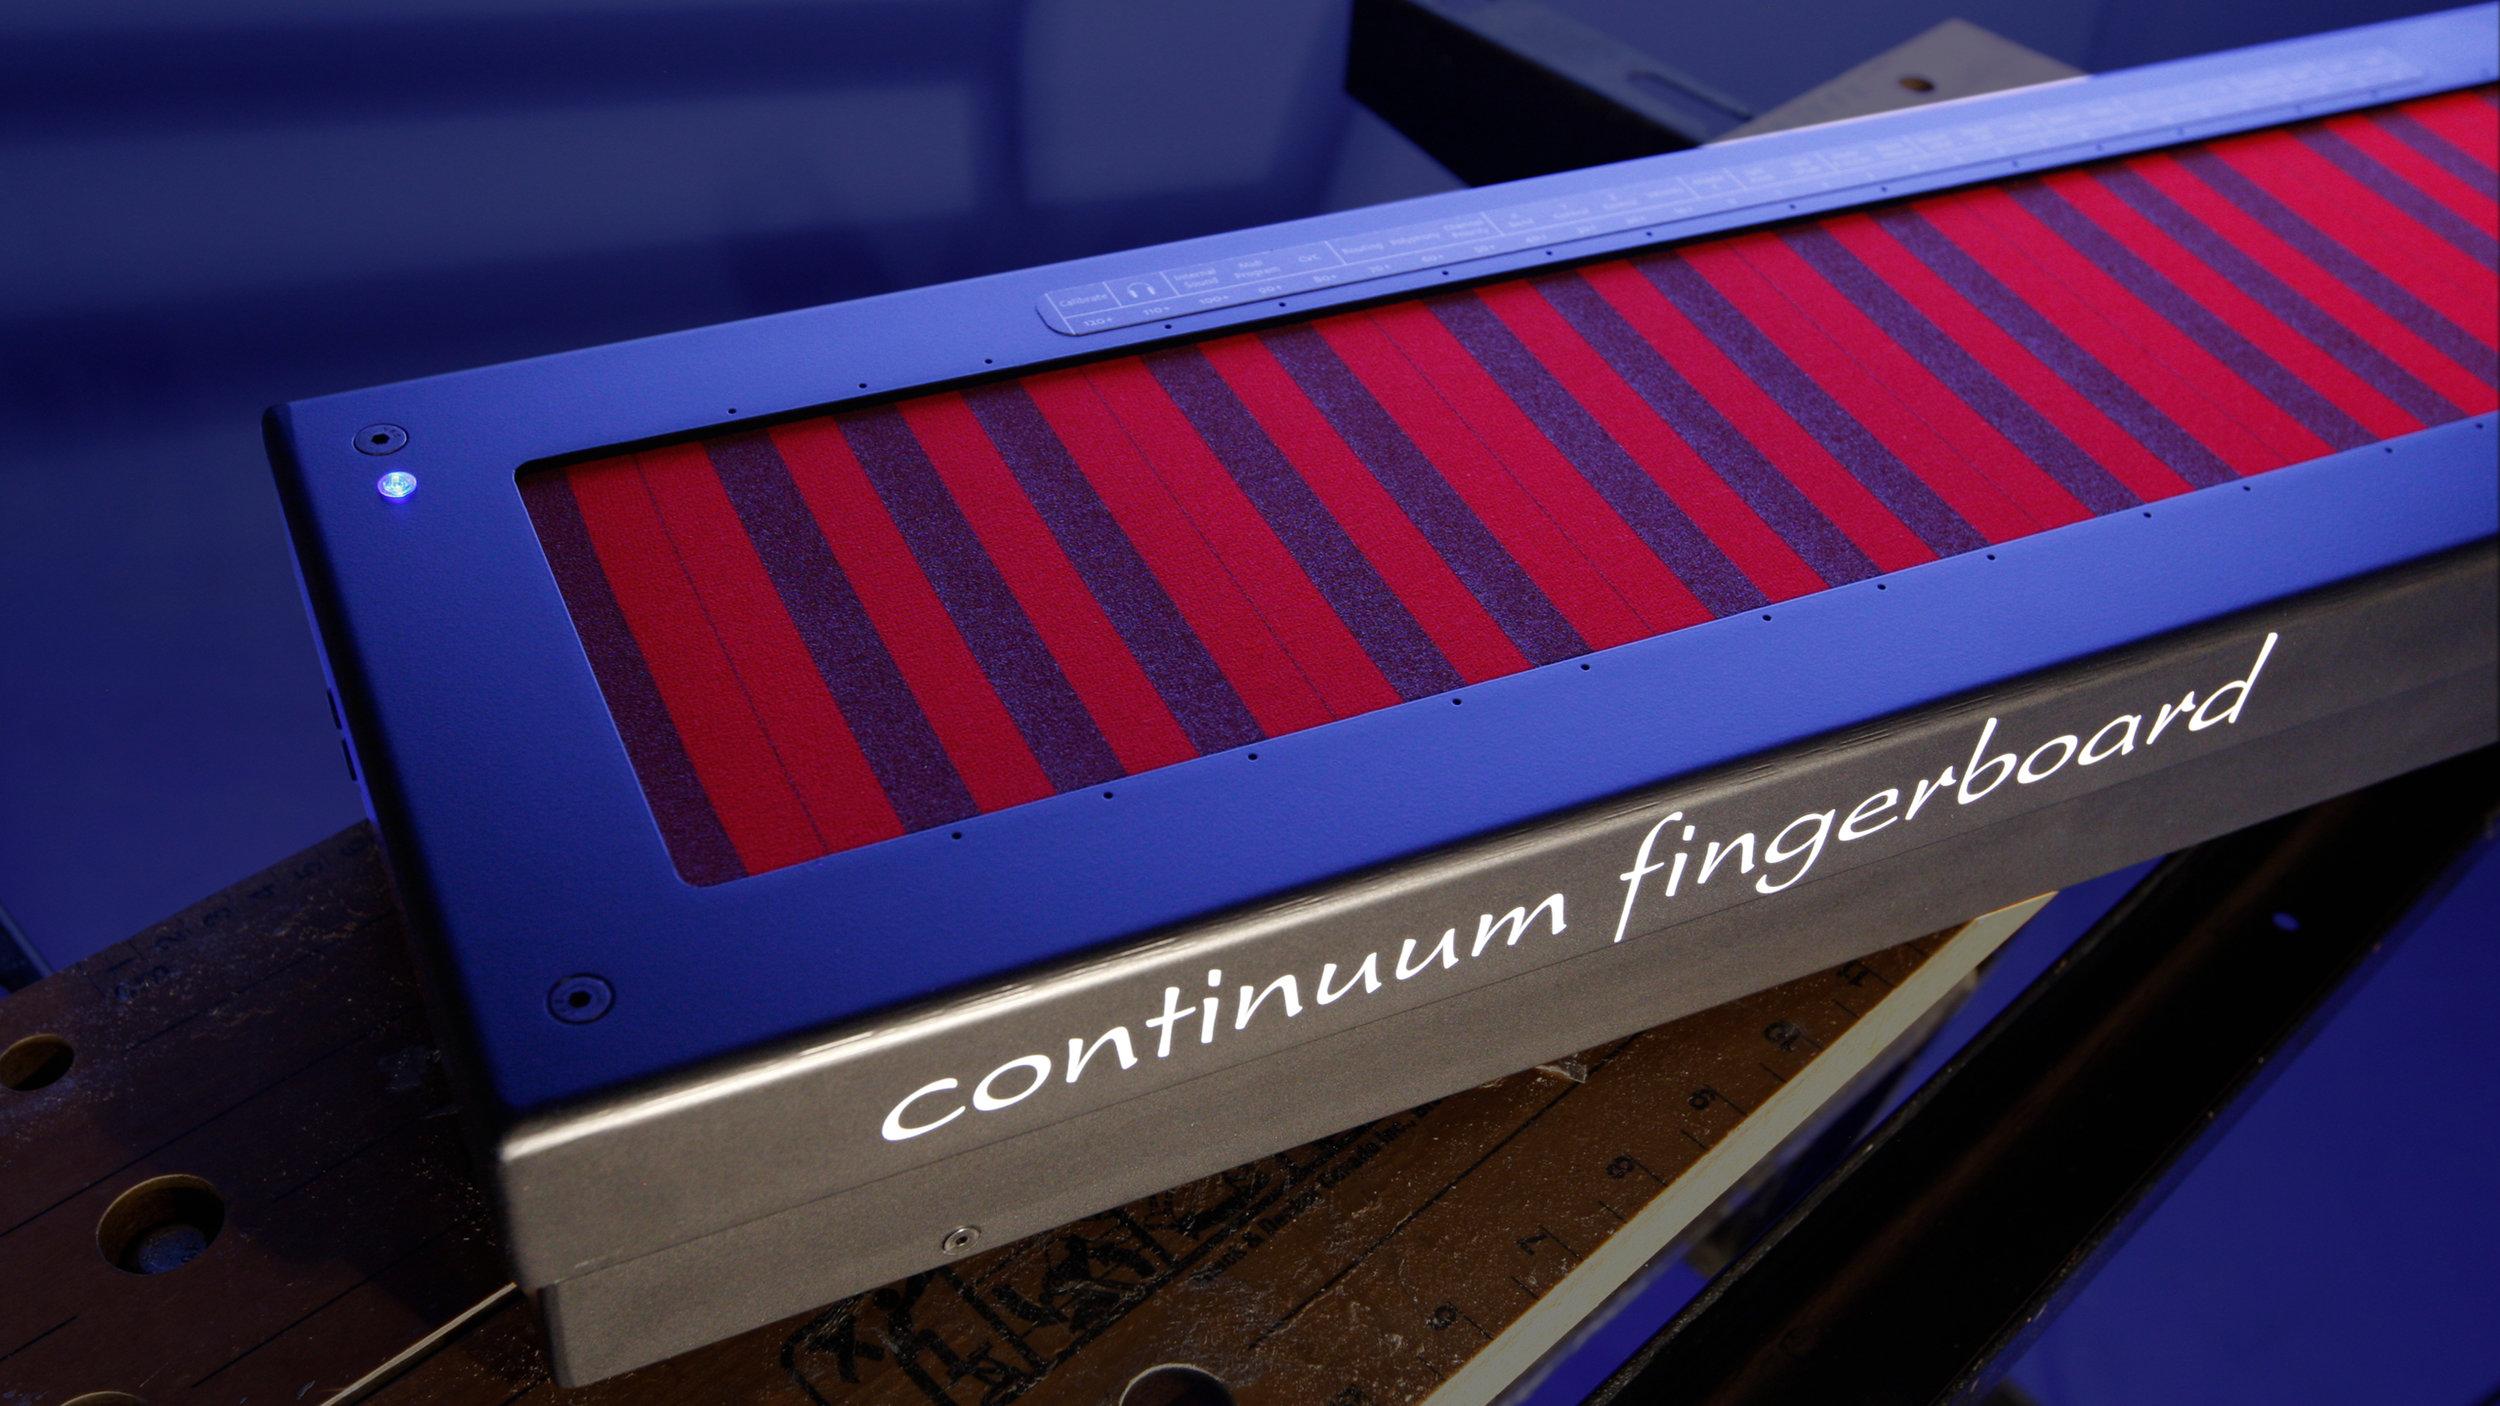 Continuum on workbench.jpg